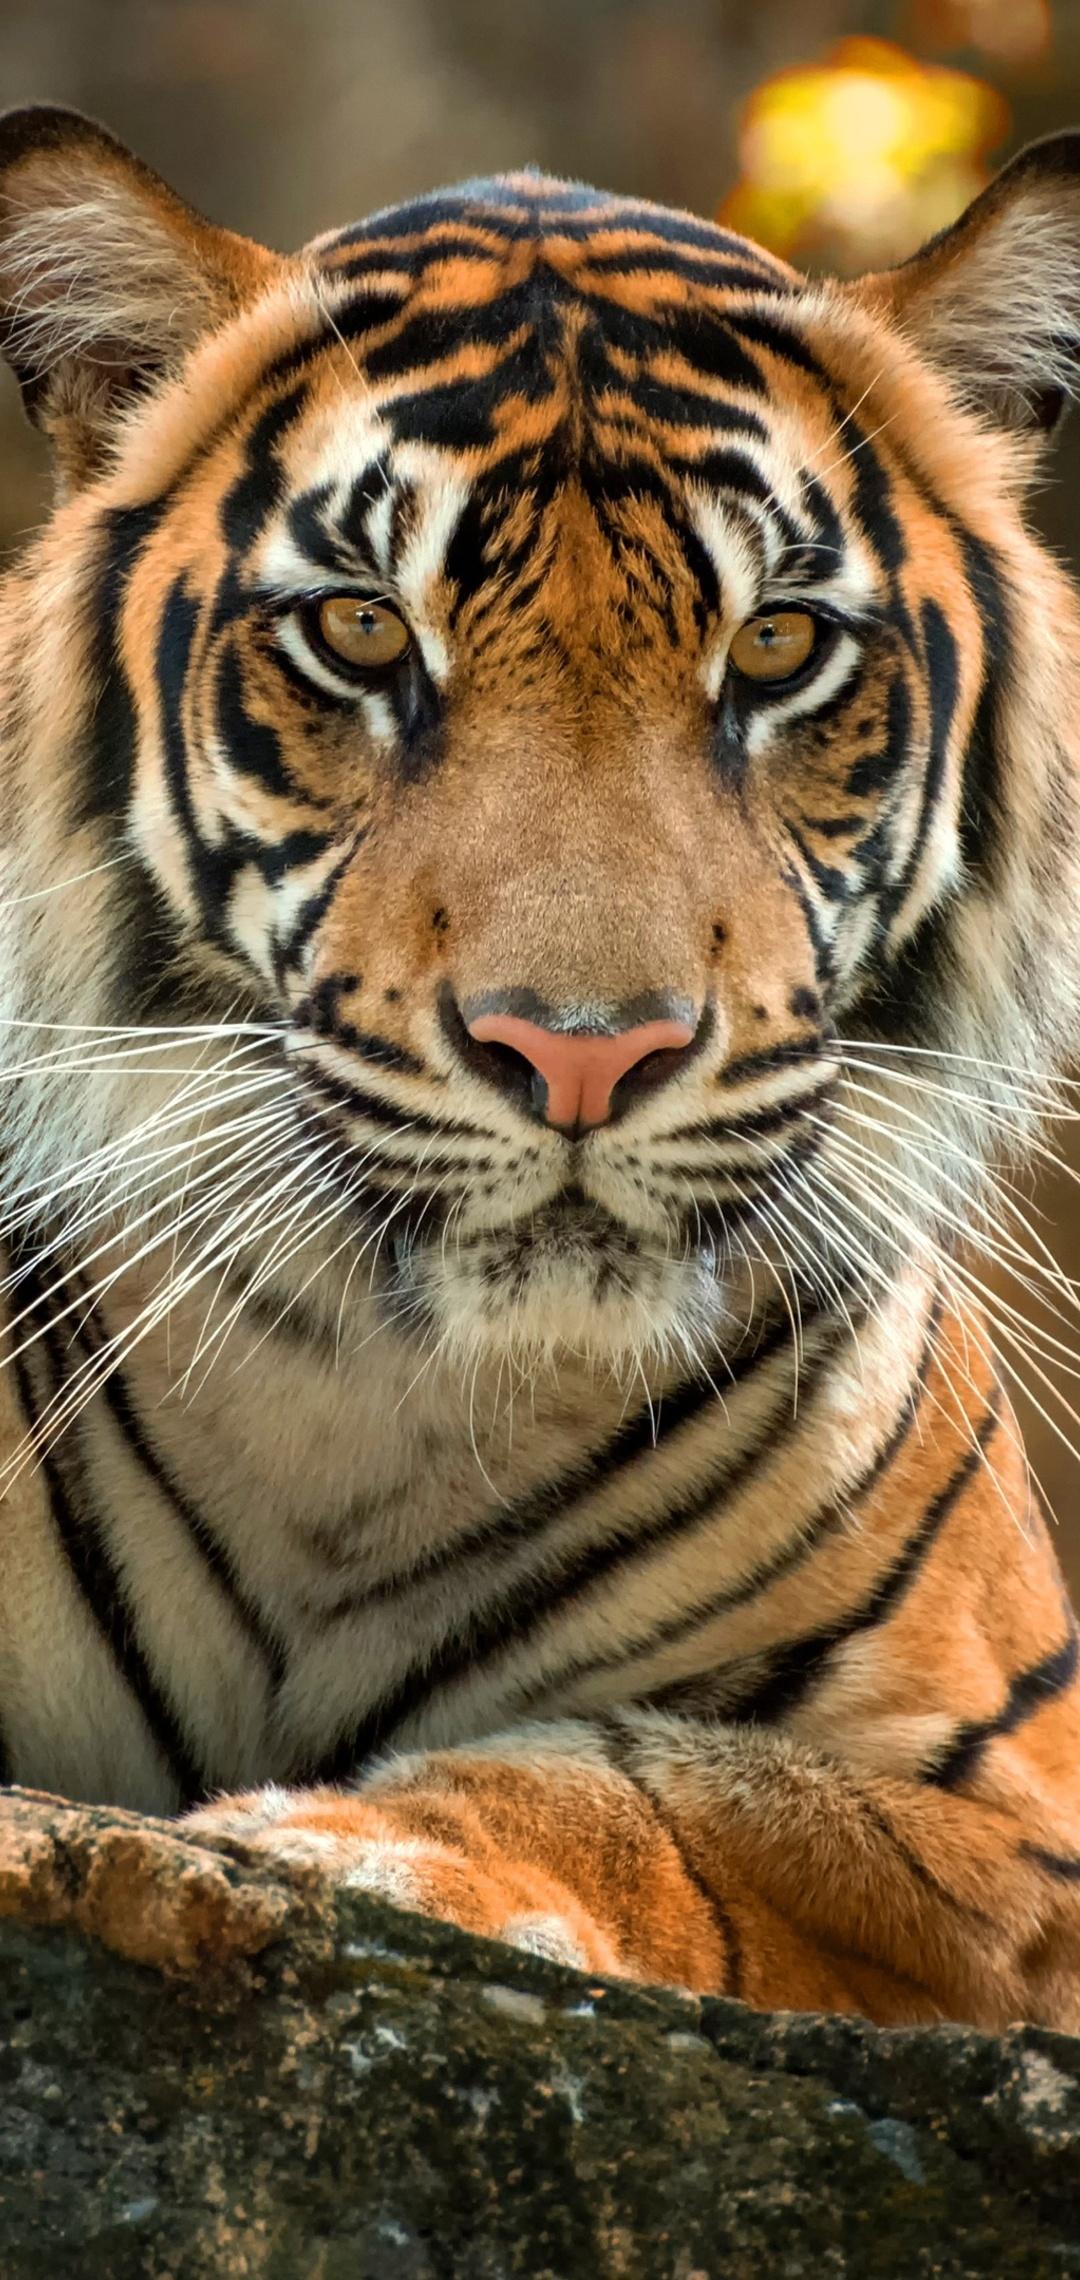 tiger-paws-4k-xa.jpg